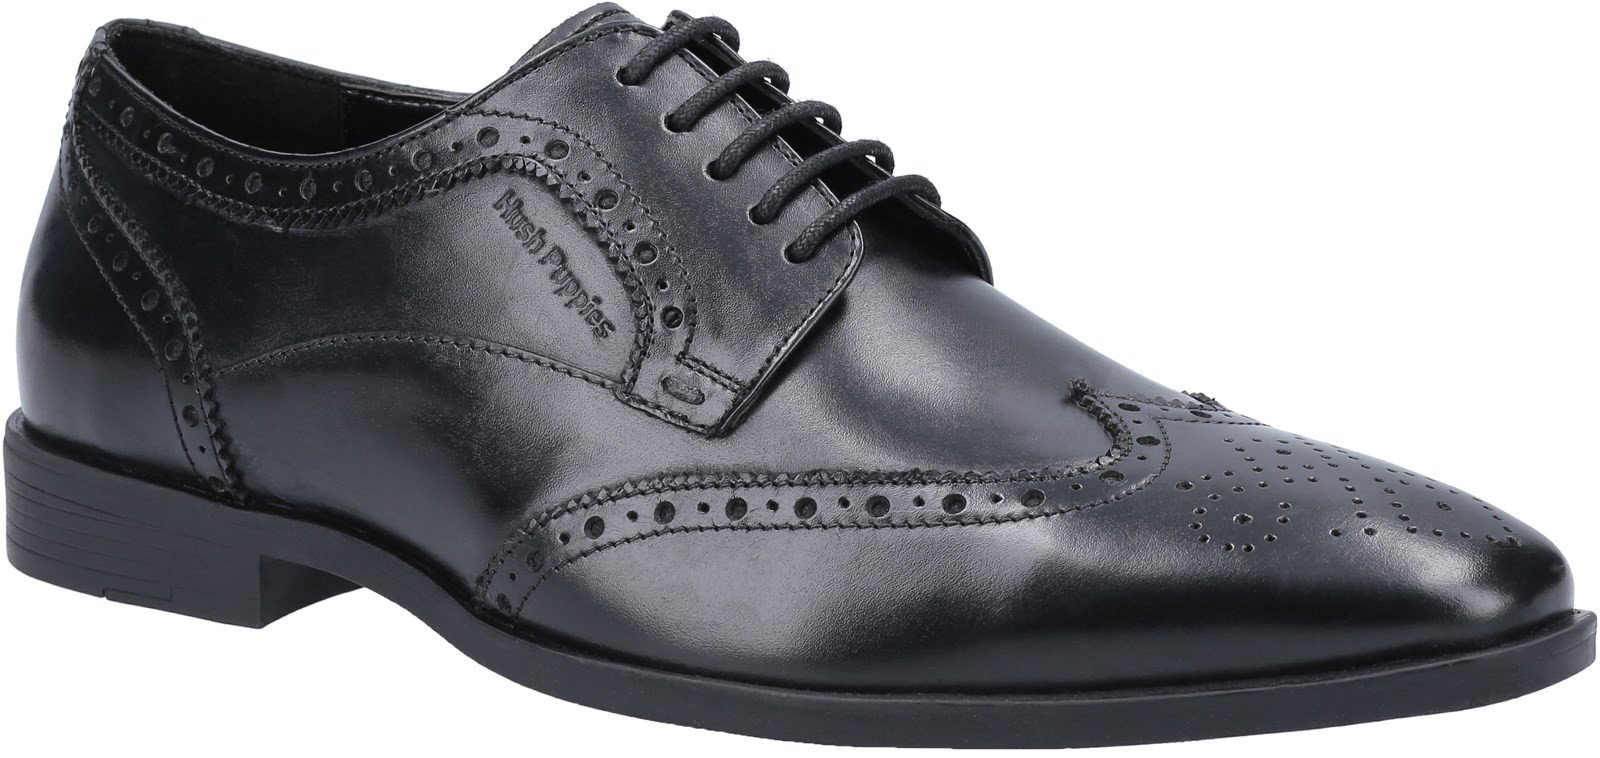 Hush Puppies Men's Elliot School Brogue Shoe Black 30814 - Black 6